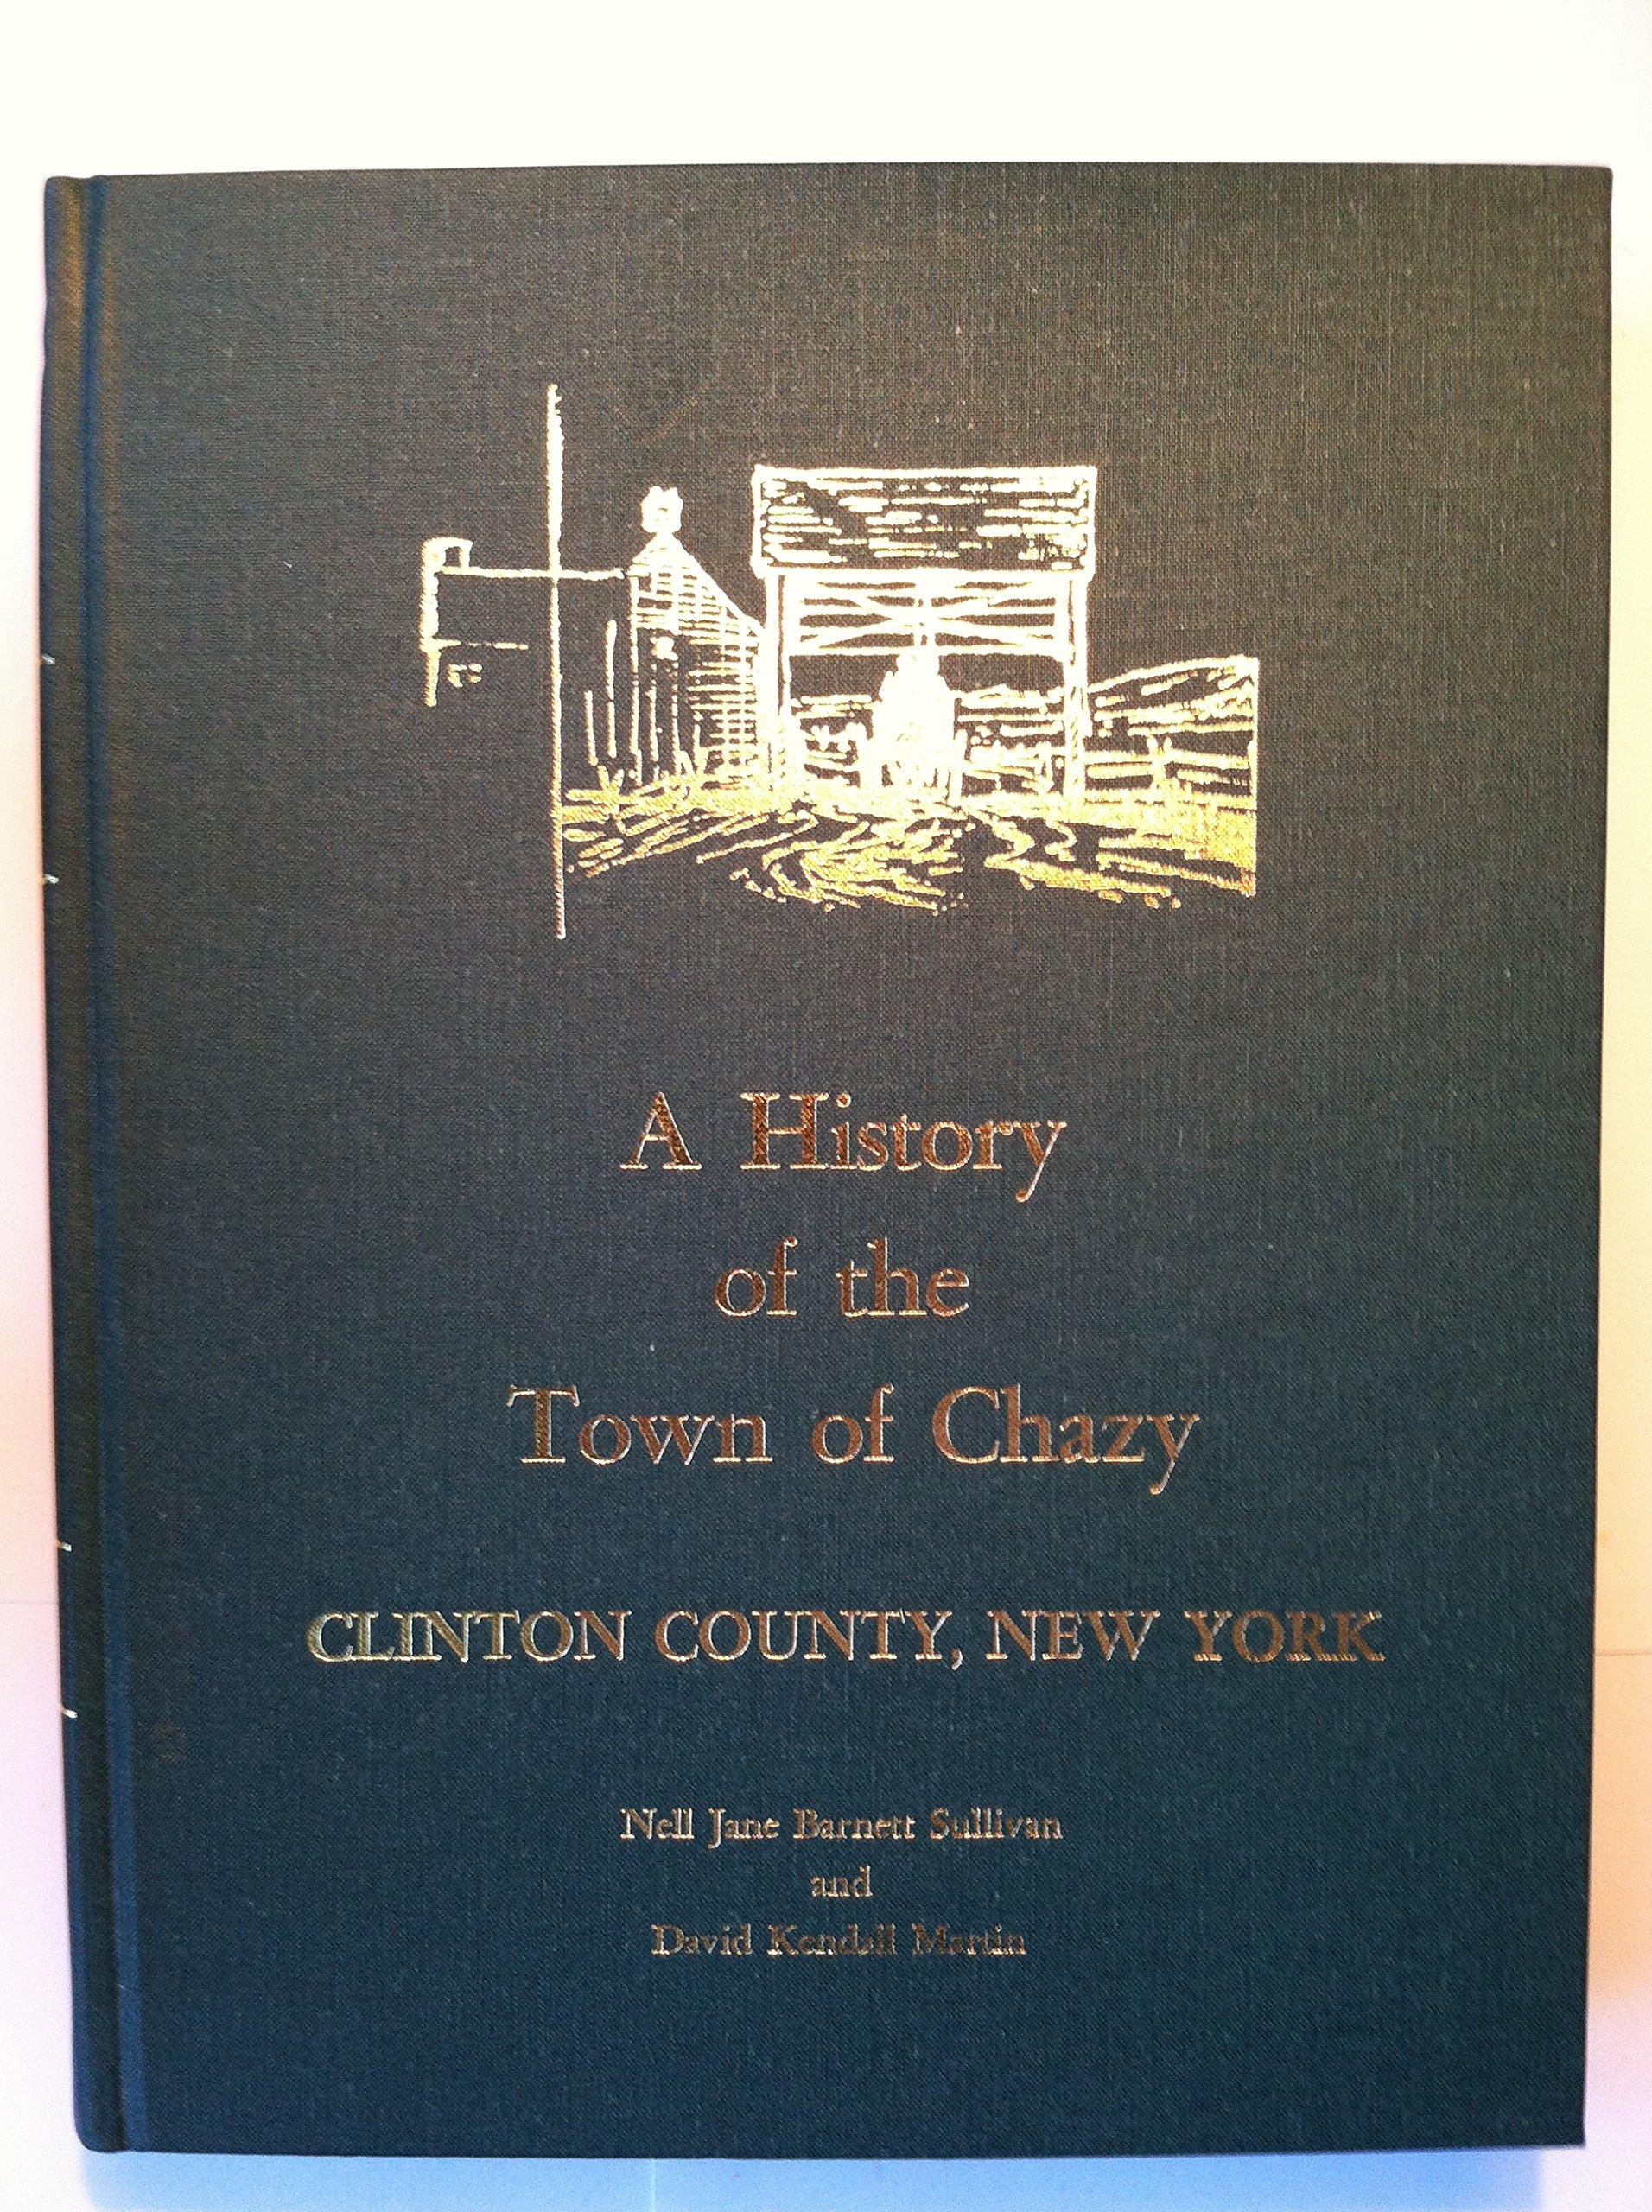 New york clinton county chazy - A History Of The Town Of Chazy Clinton County New York Nell Jane Barnett Sullivan David Kendall Martin Amazon Com Books